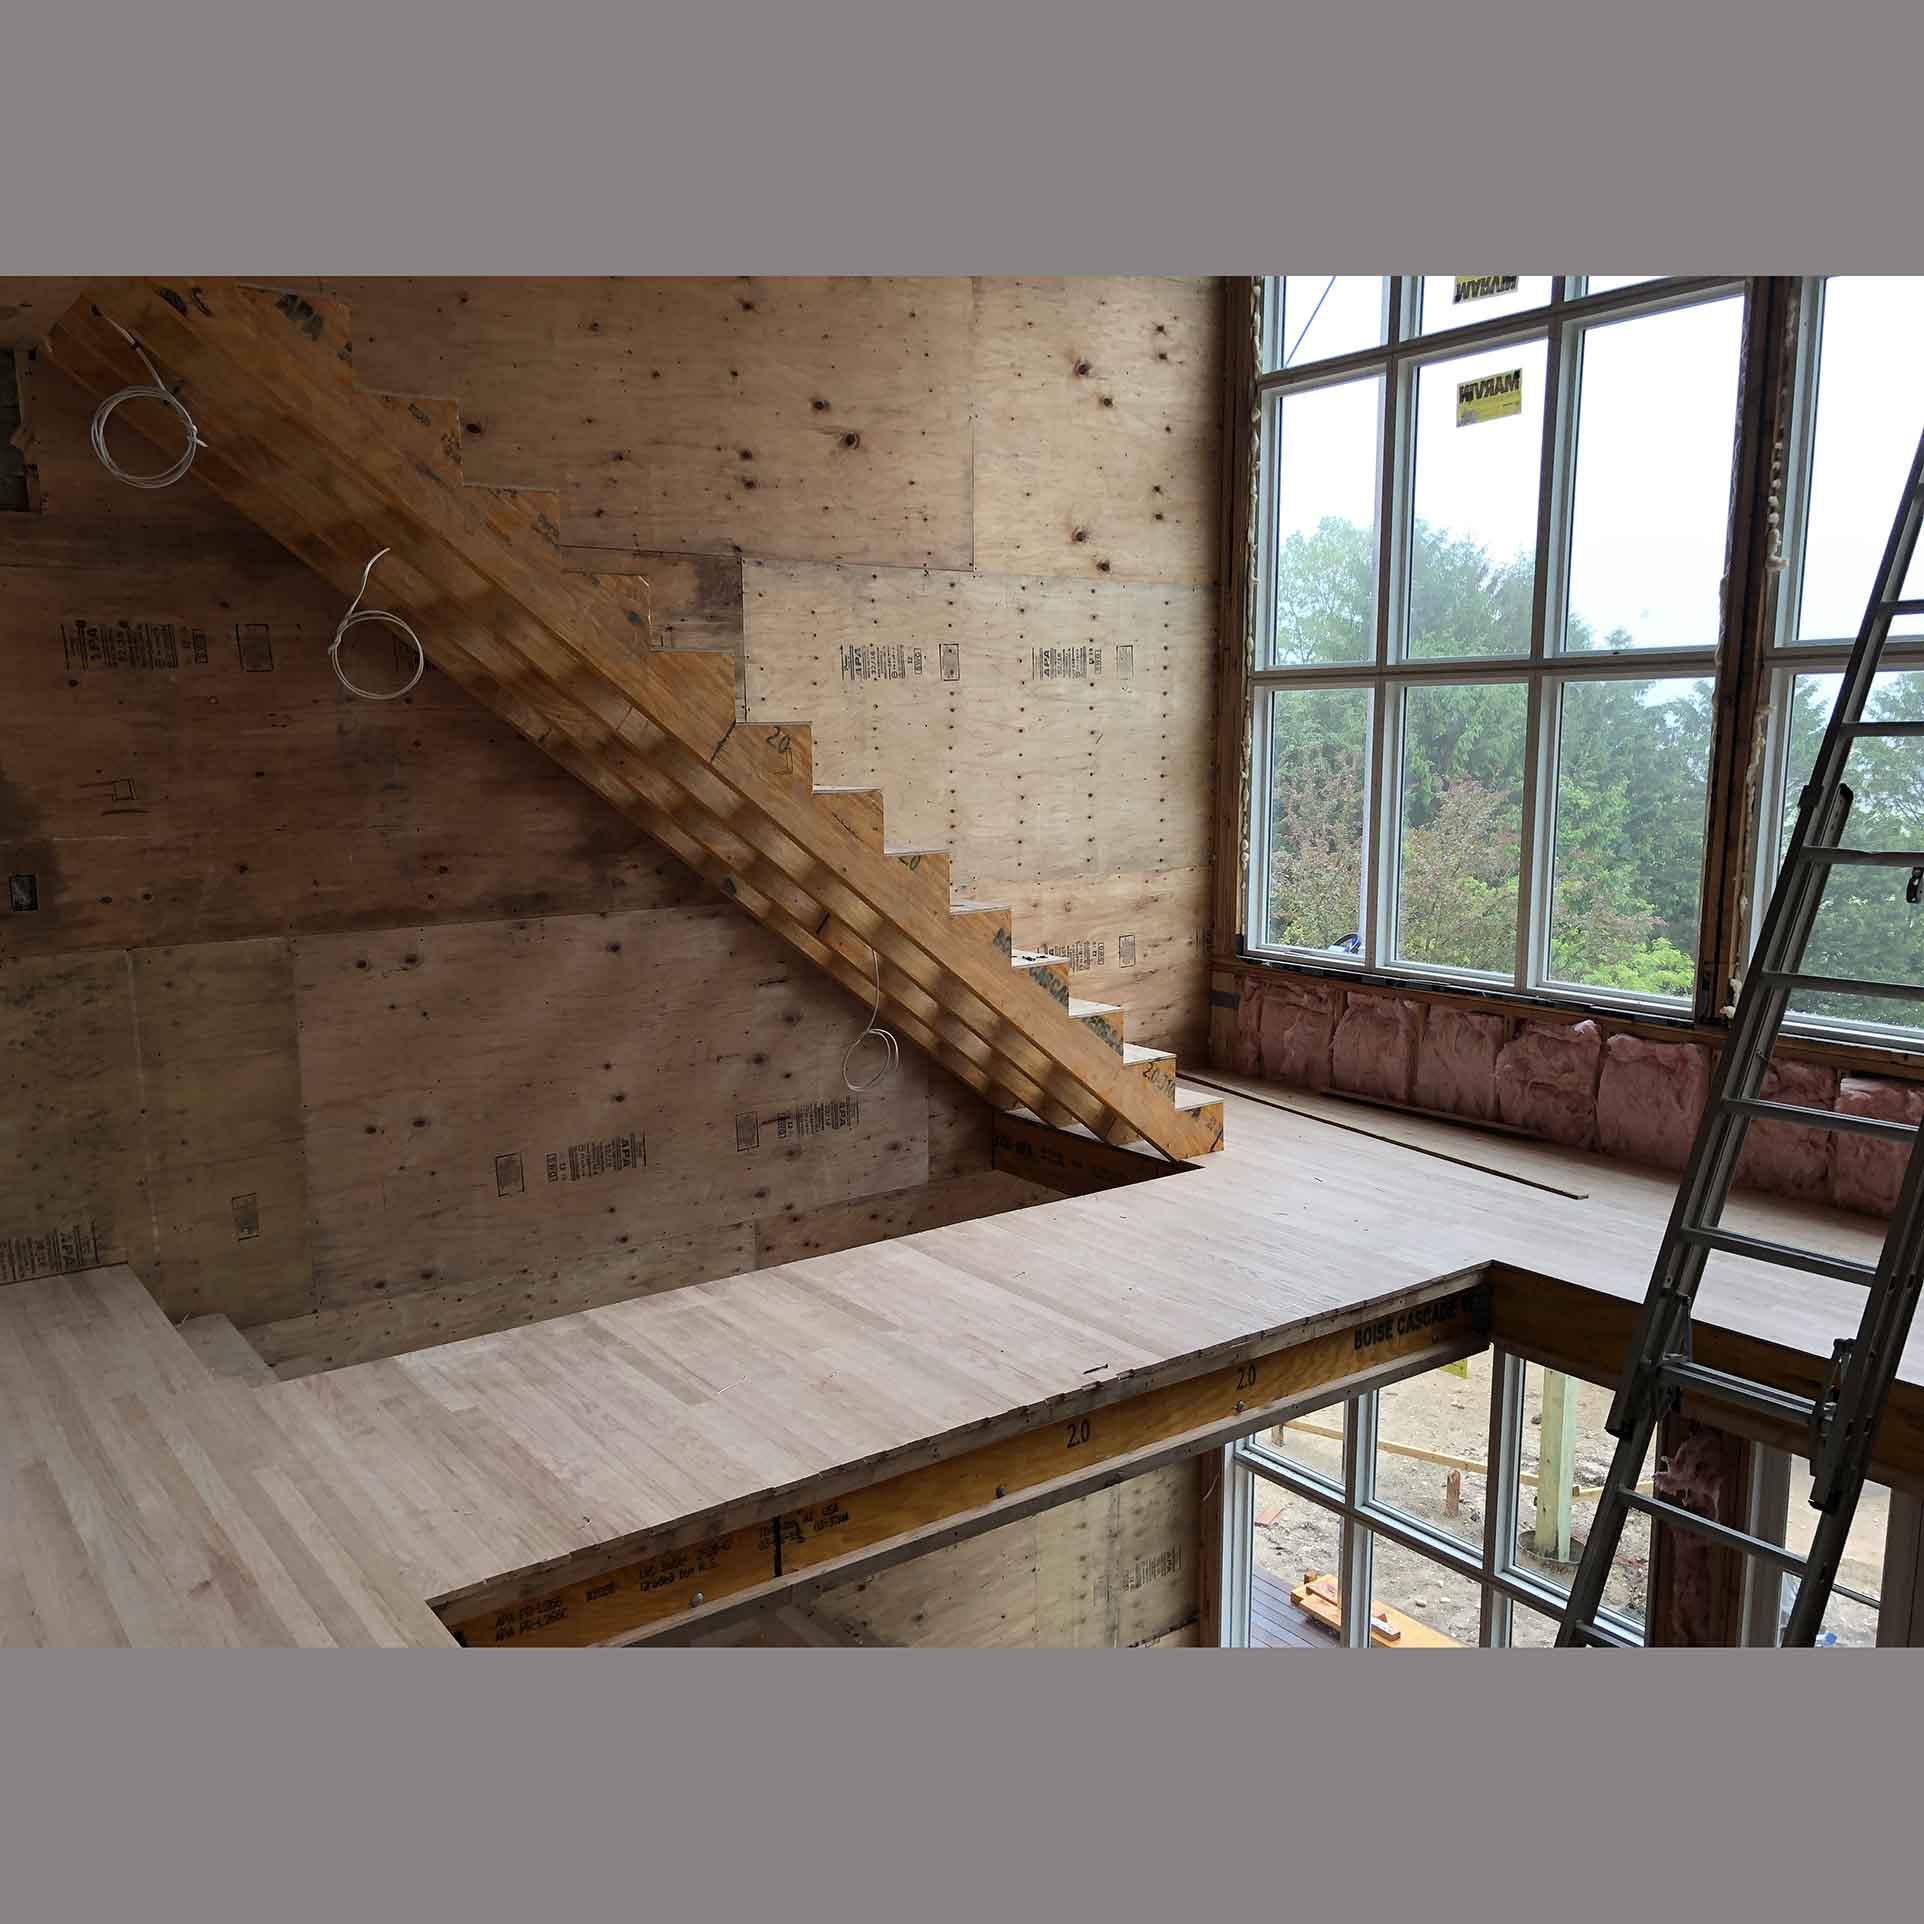 handrail_8.jpg